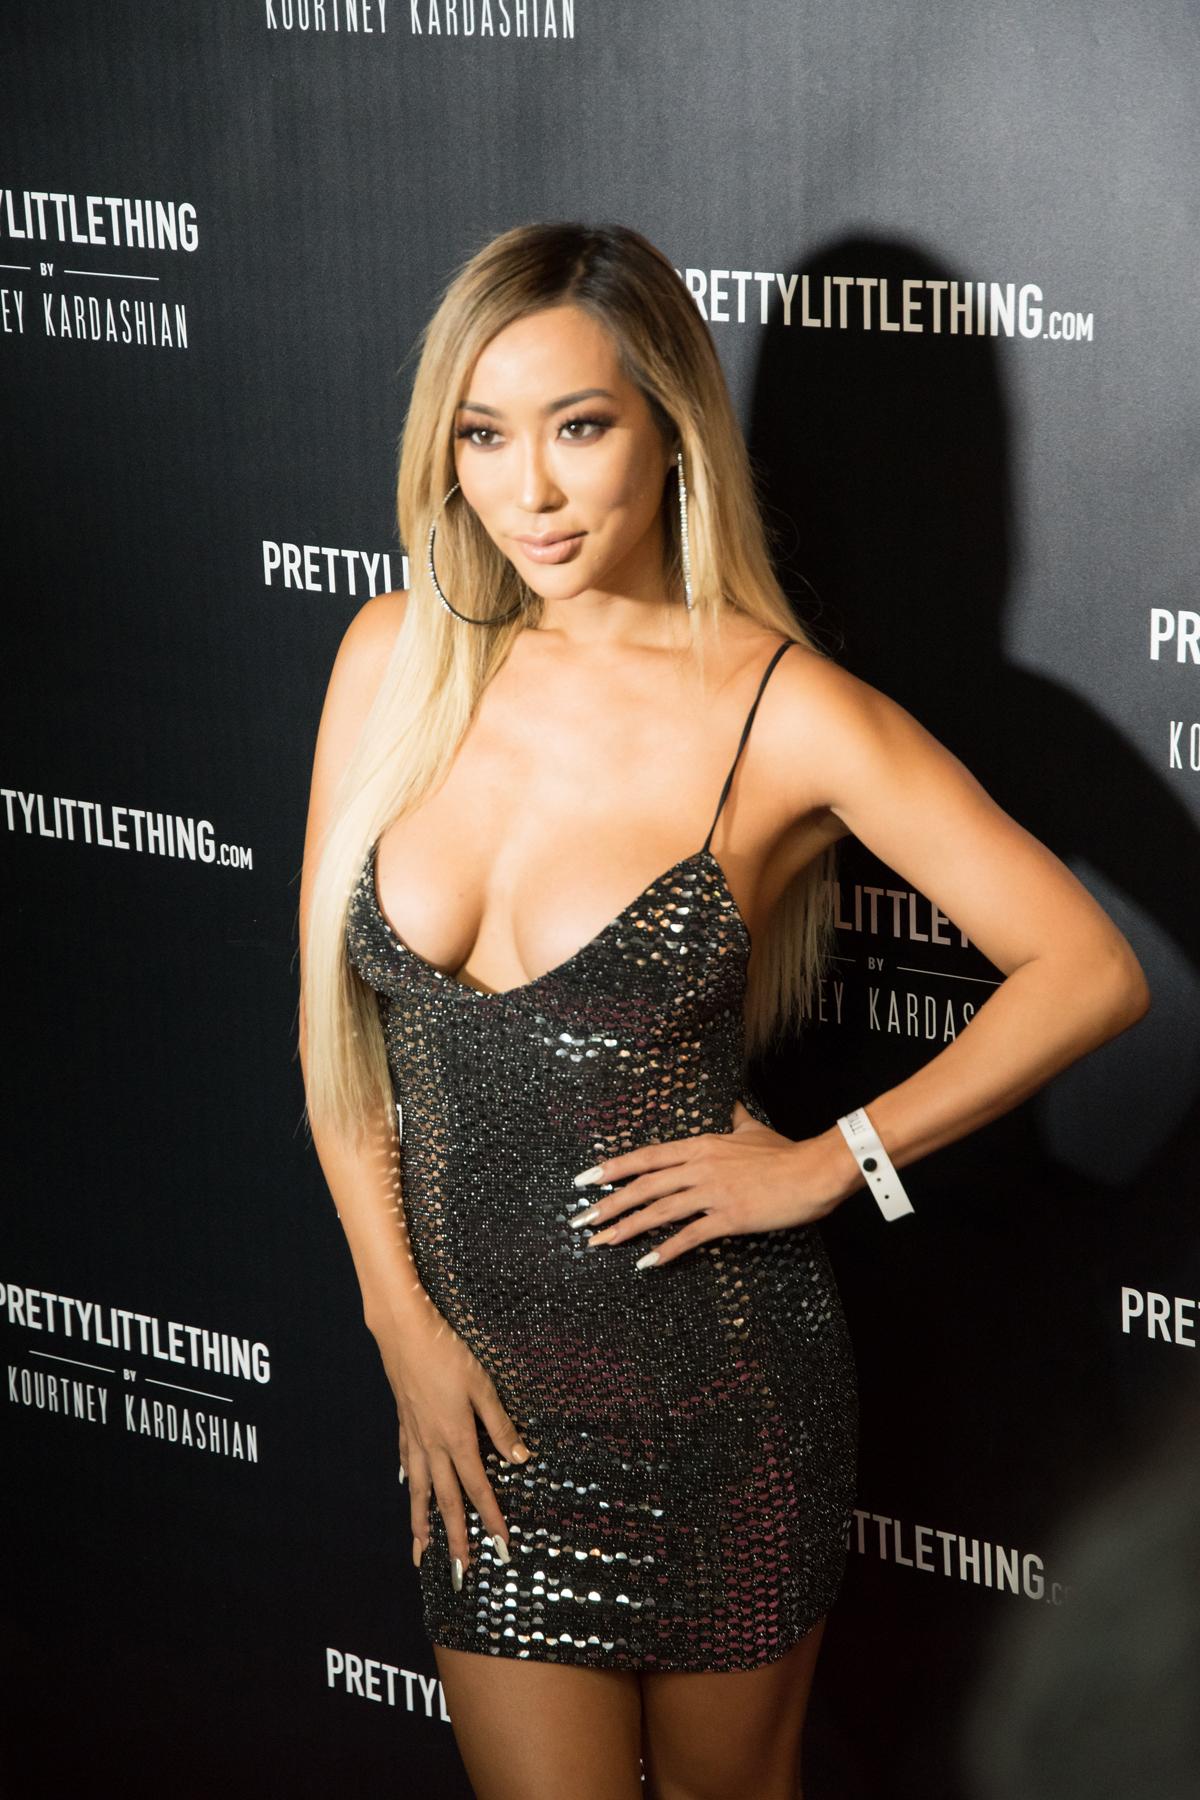 PrettyLittleThing PLT X Kourtney Kardashian Collection Celebrity Launch Party Arika Soto.jpg